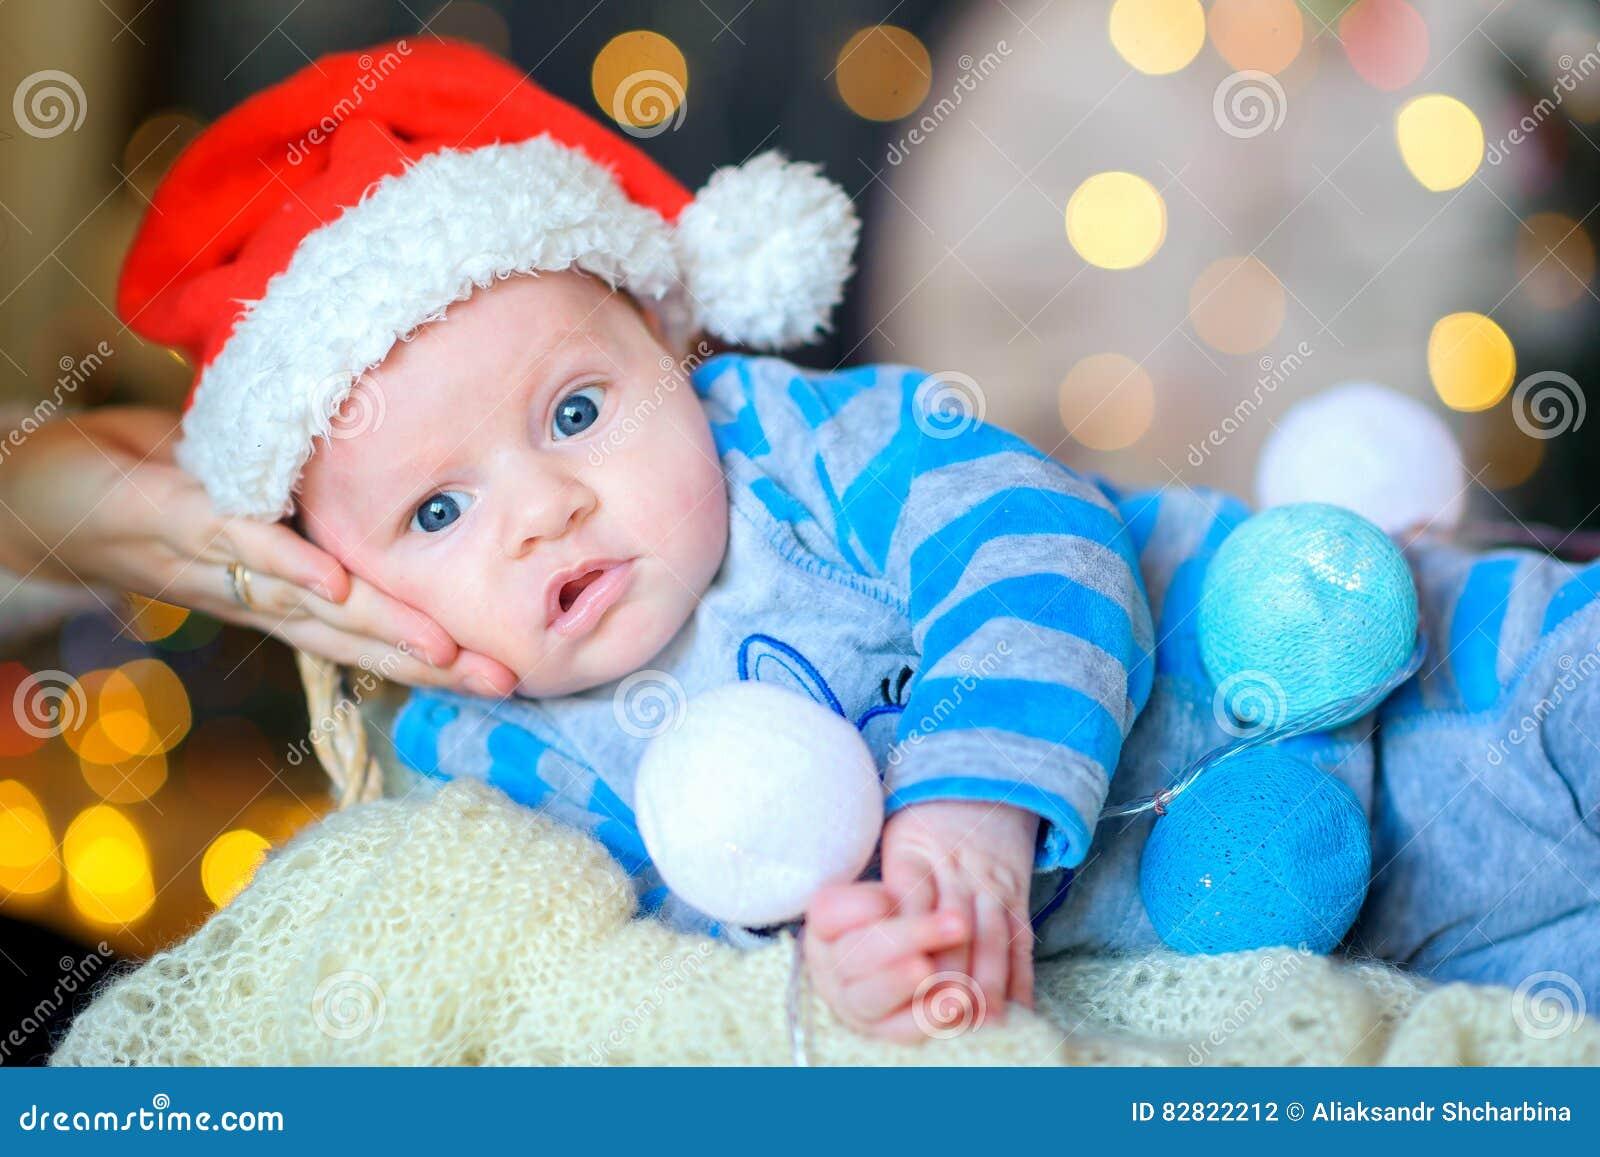 26813de03b5 Newborn Baby In Santa Claus`s Cap Stock Photo - Image of beautiful ...